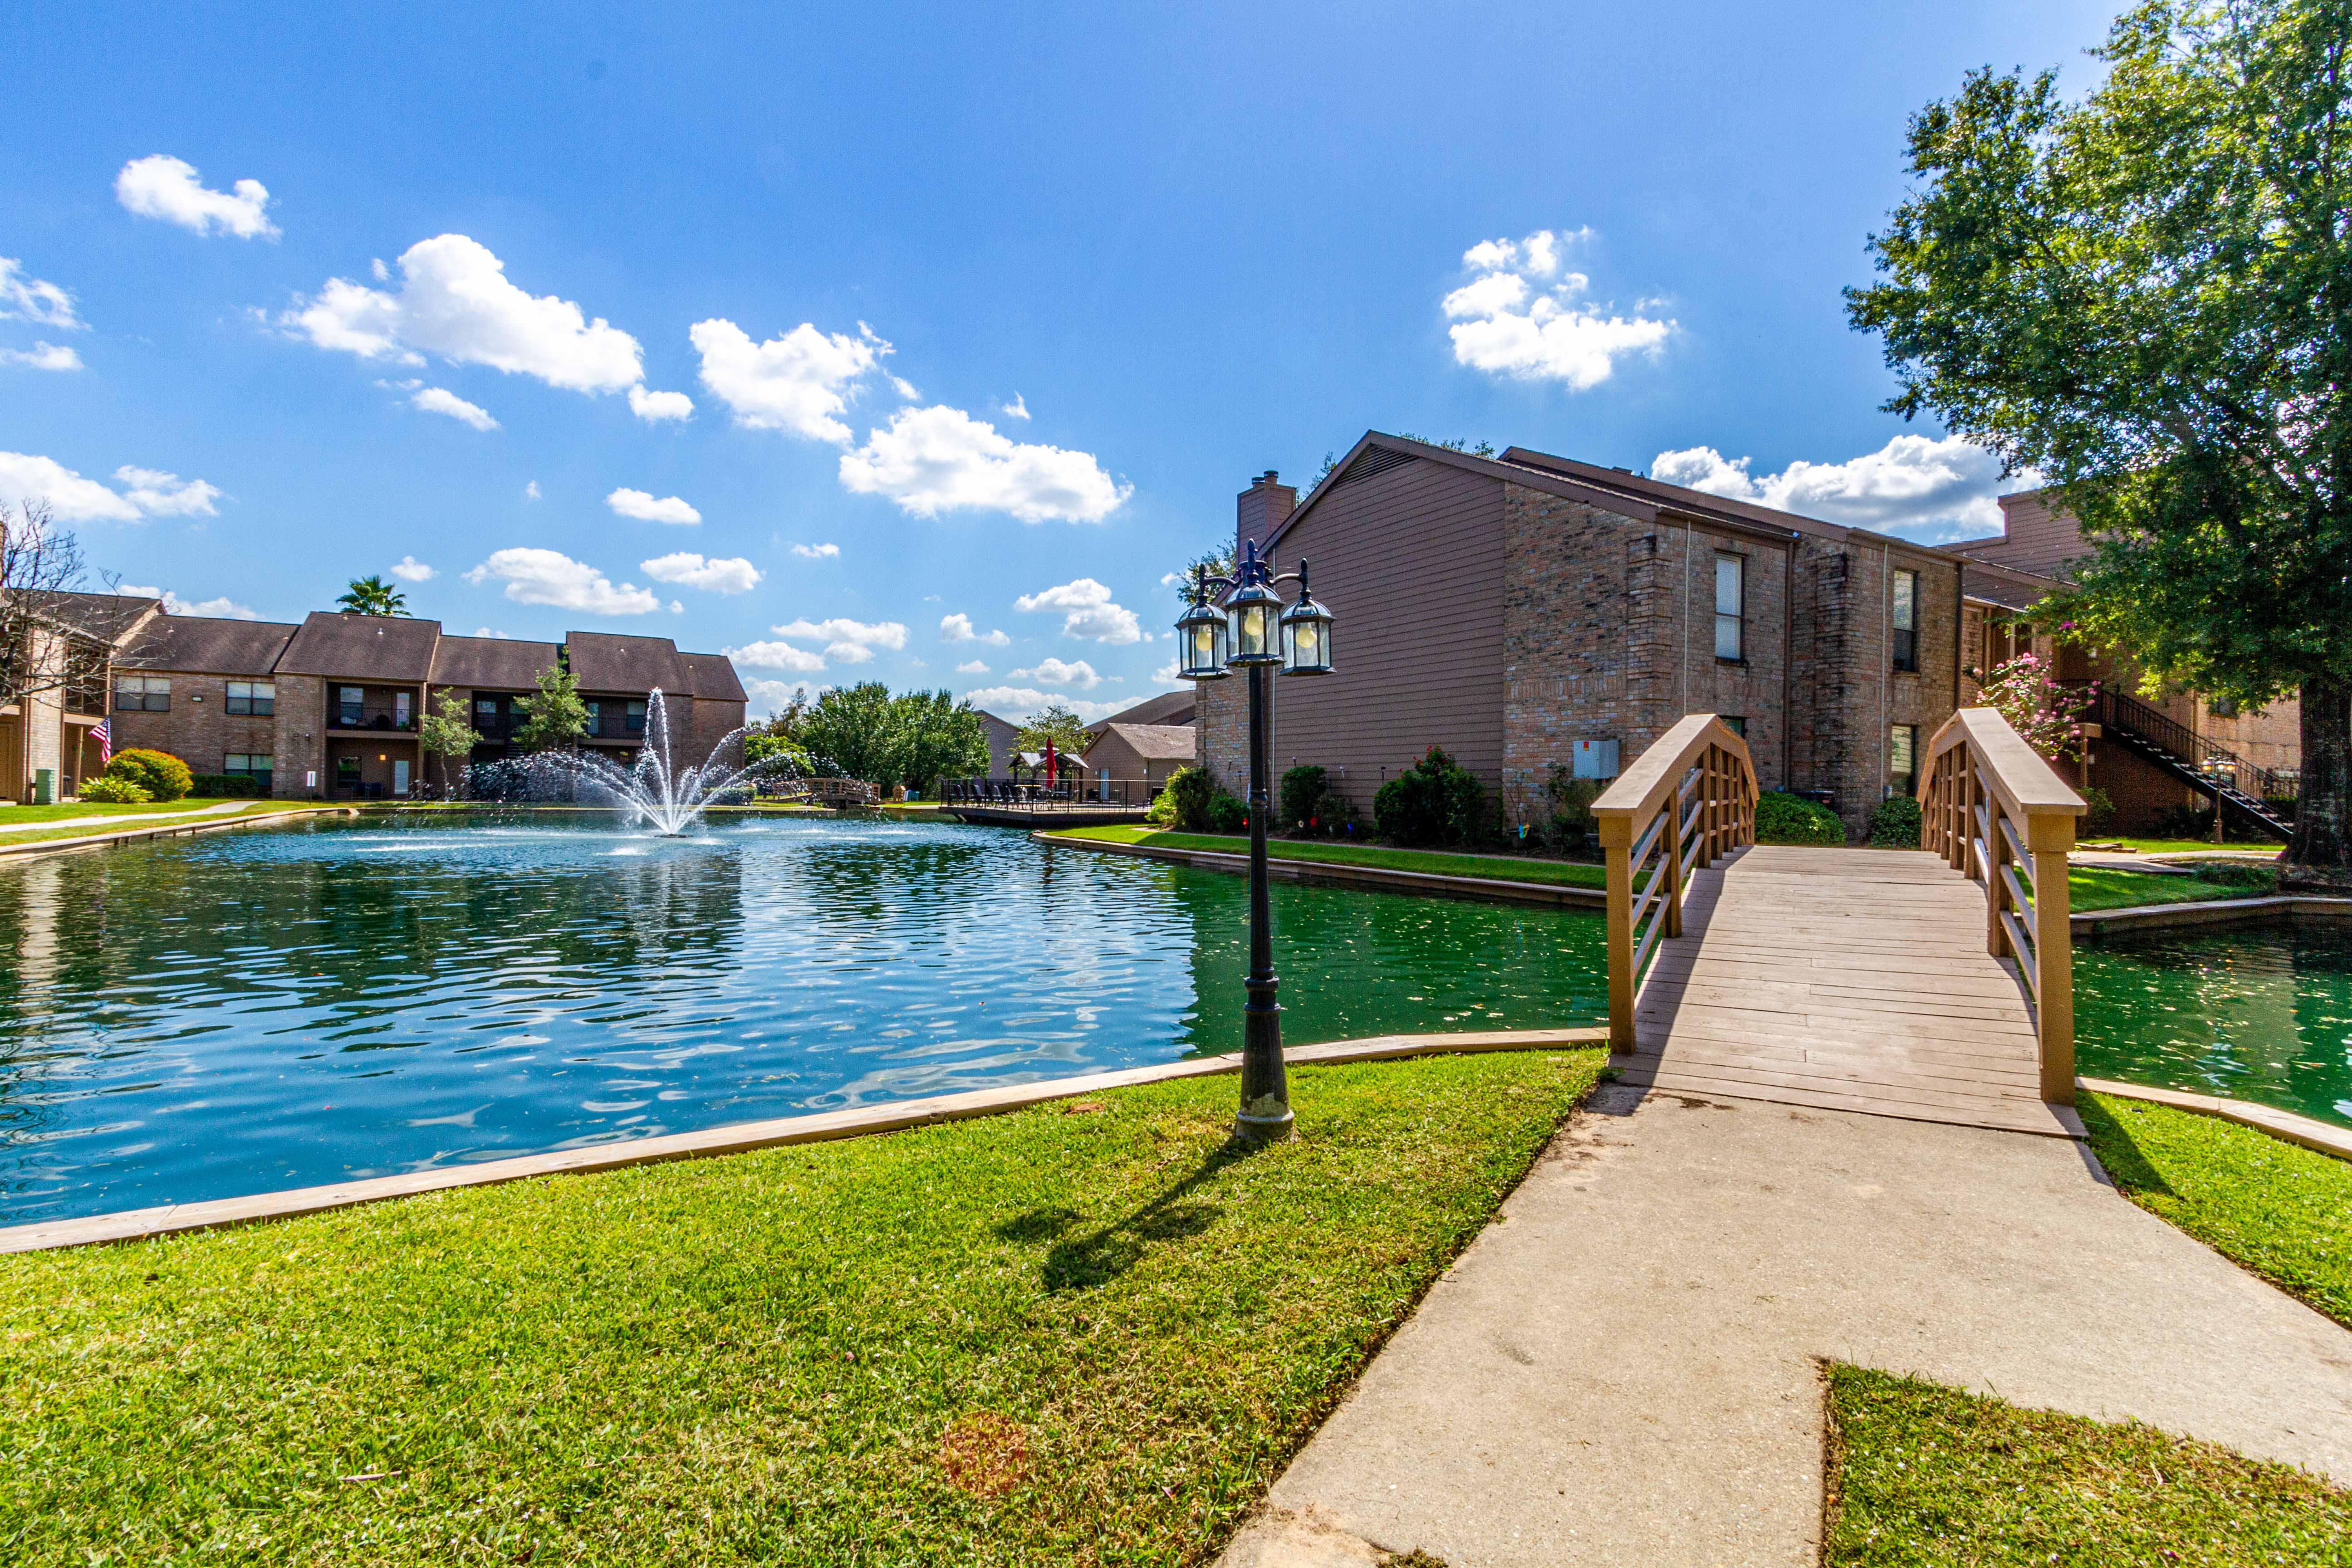 Lakebridge Apartments